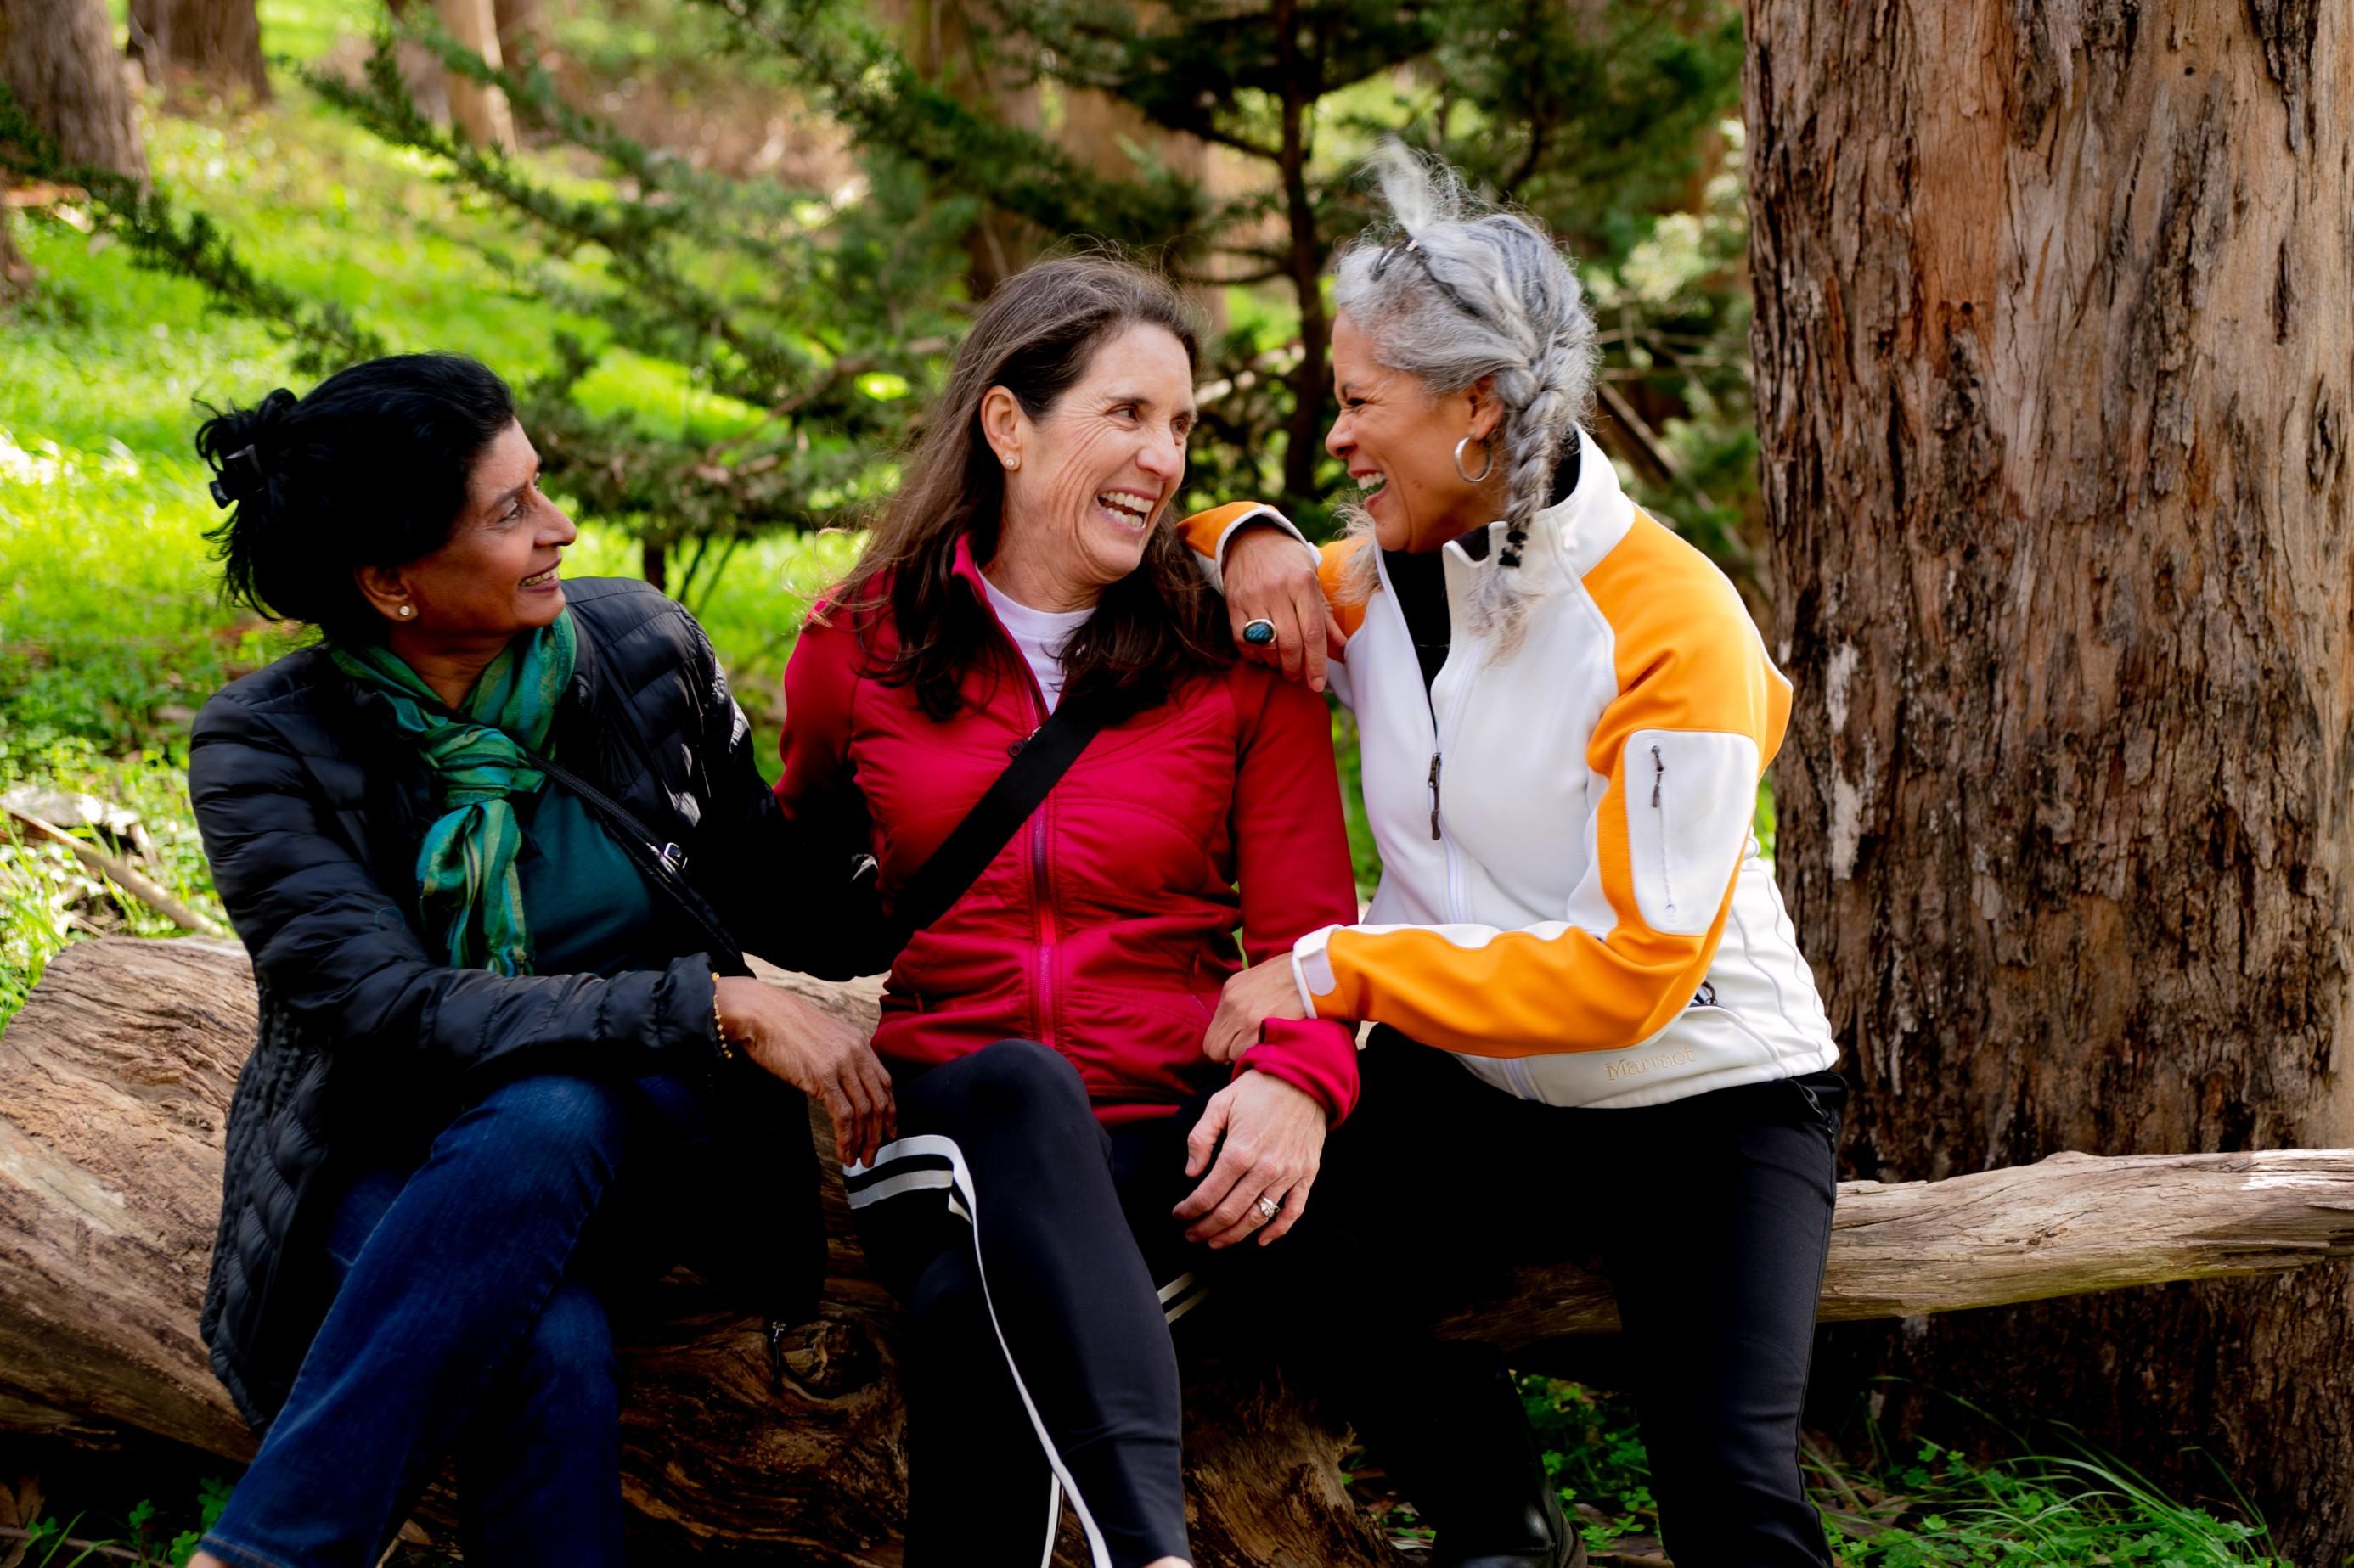 Ladies in conversation outdoors.